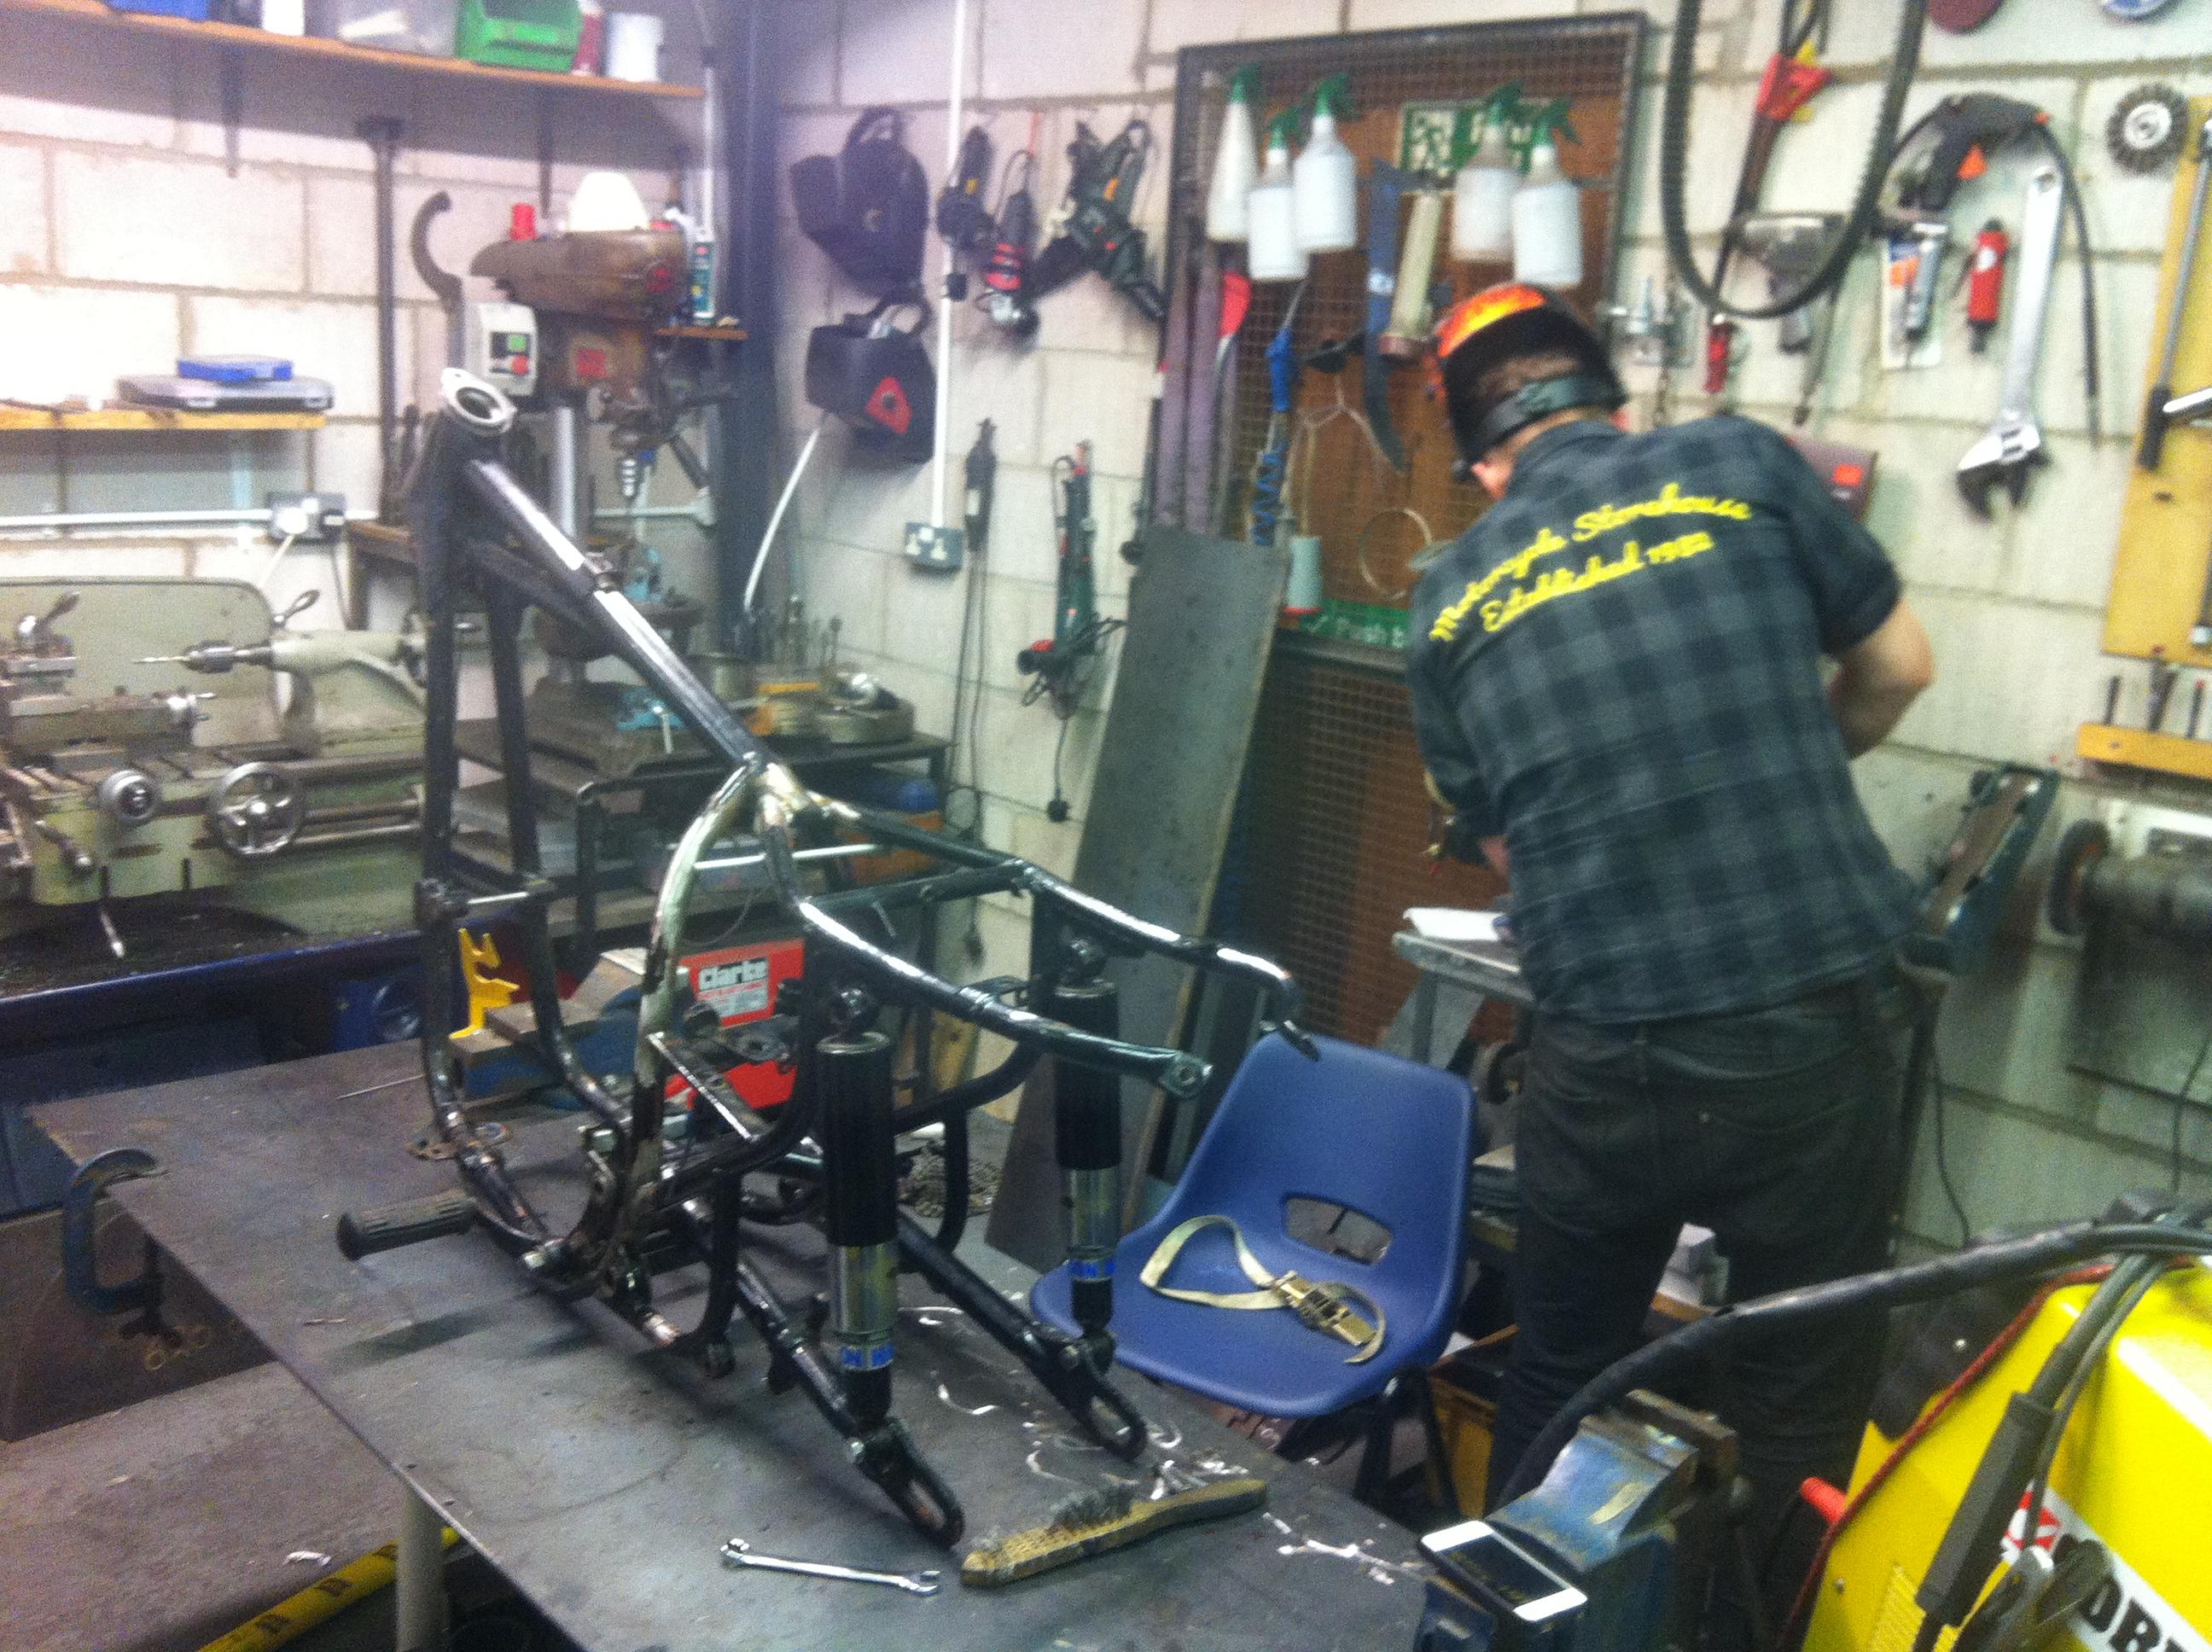 Old BSA repair